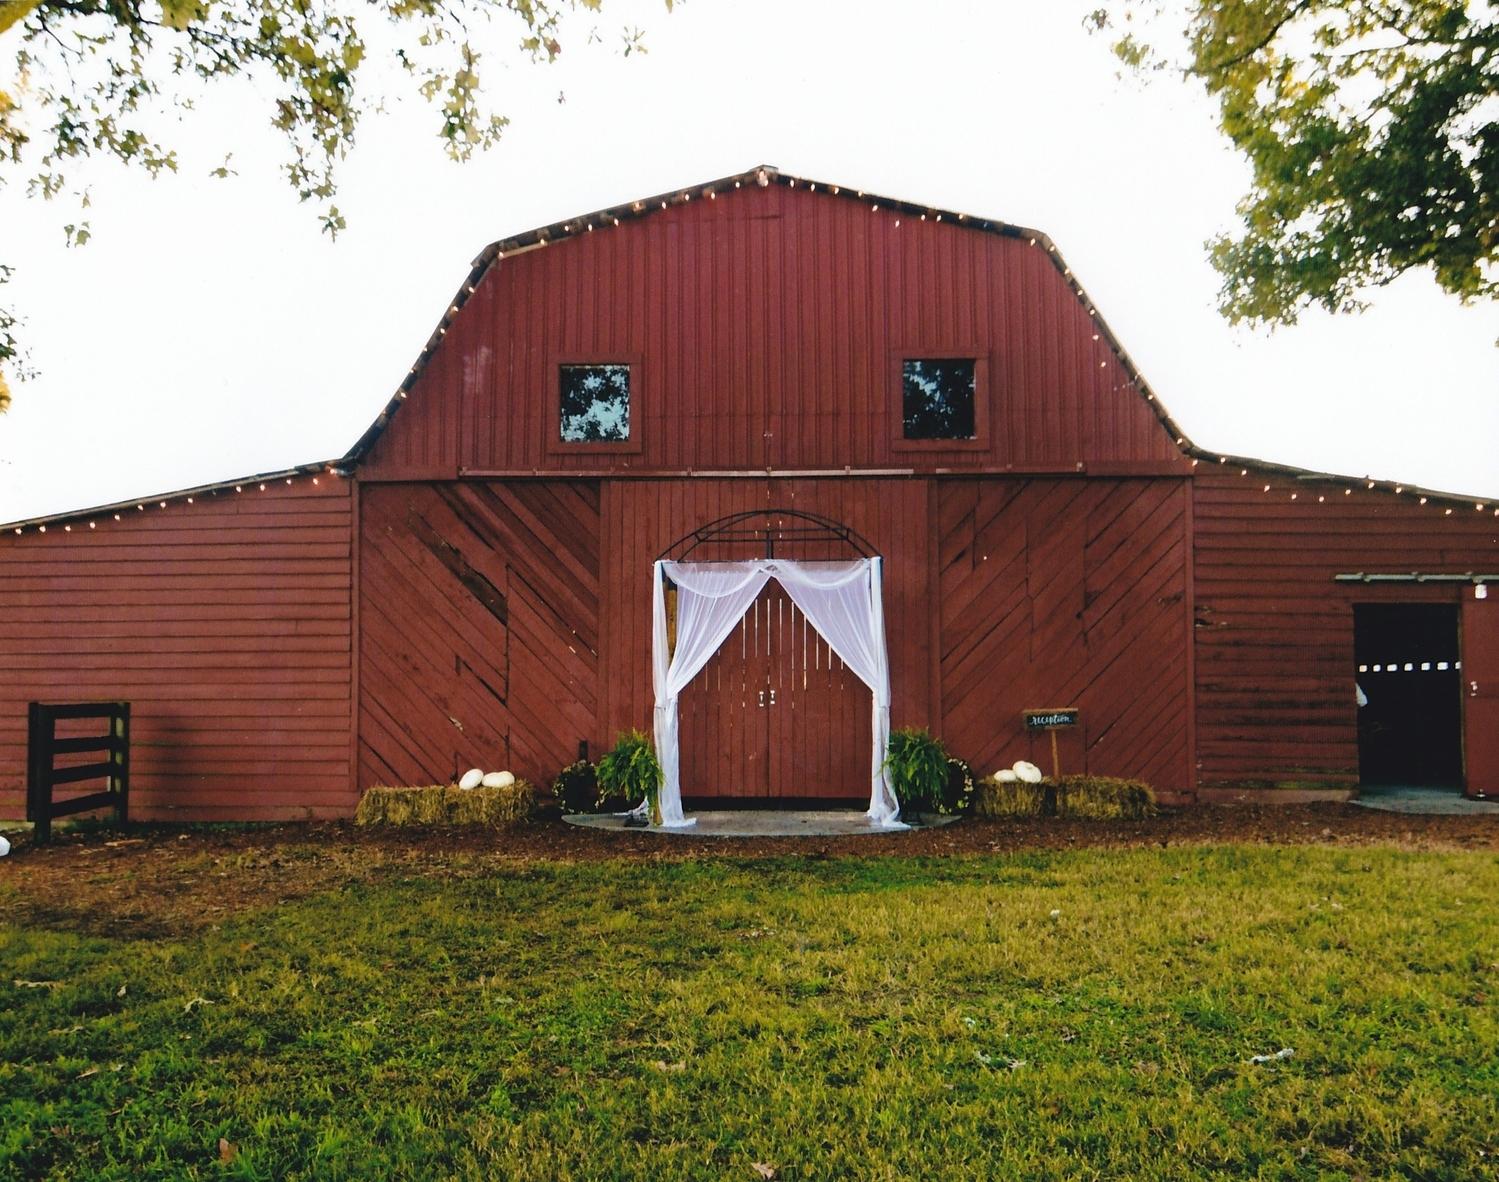 The 1932 Barn